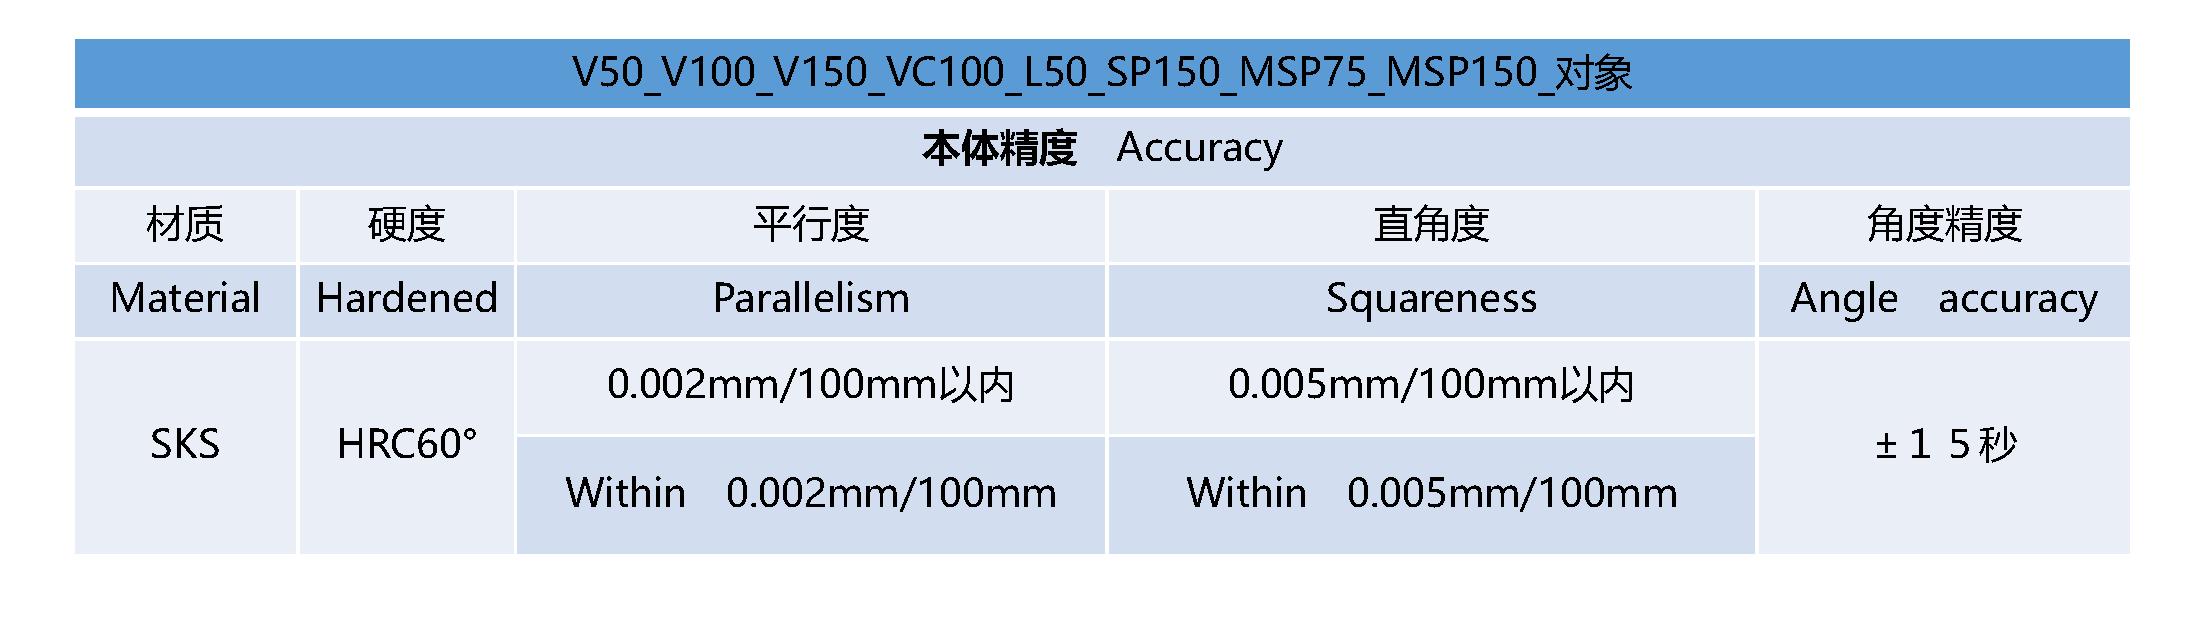 V50_V100_V150_VC100_L50_SP150_MSP150_精度表- 中文.png